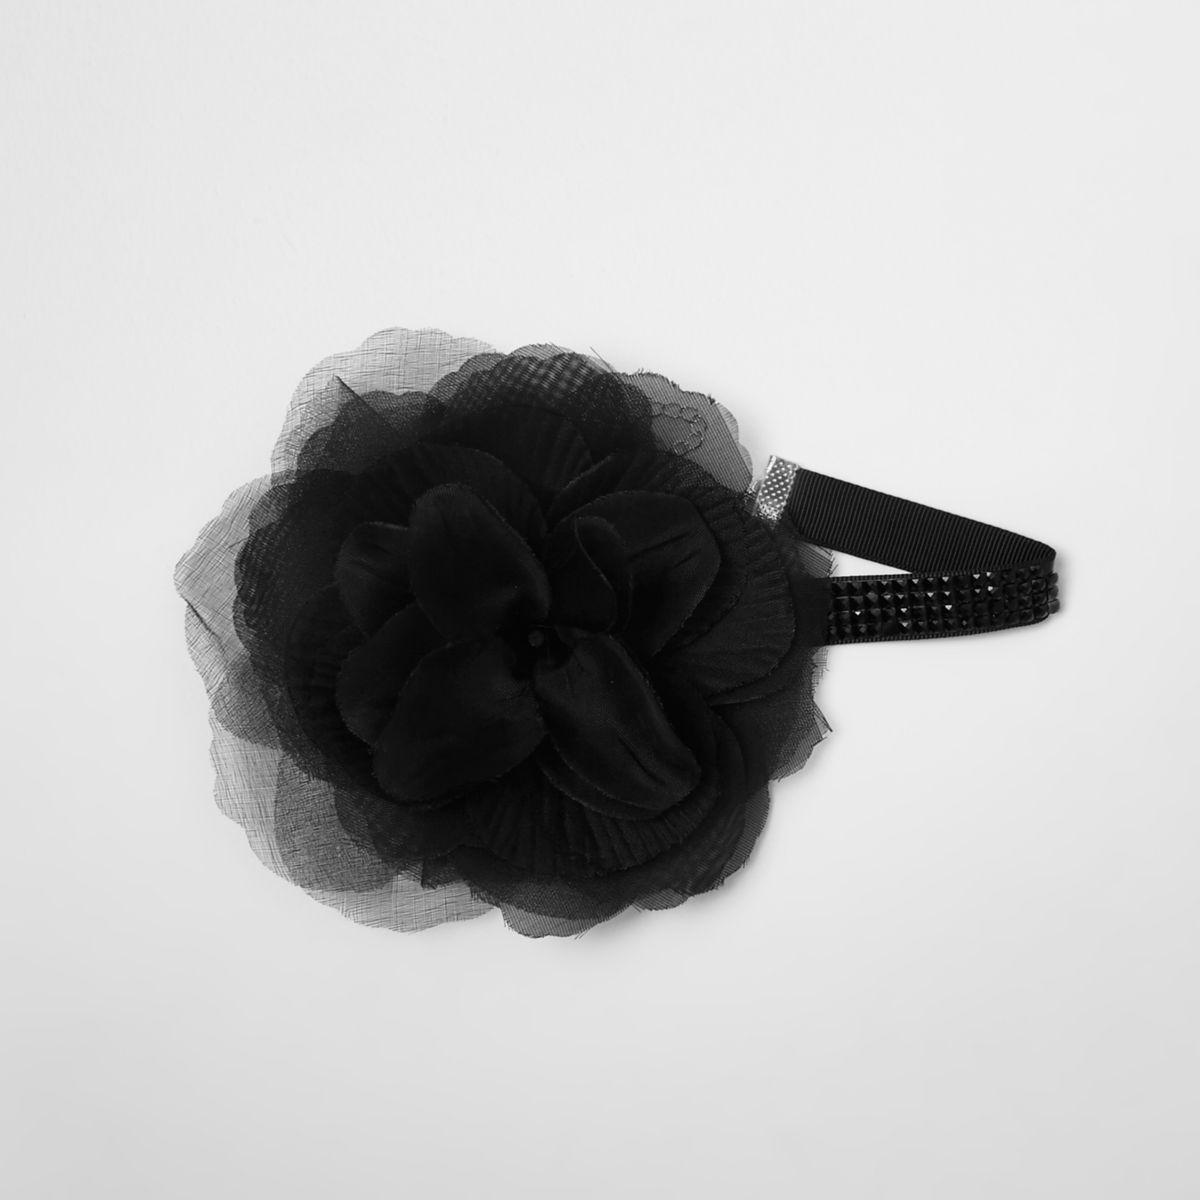 Black oversized flower corsage choker